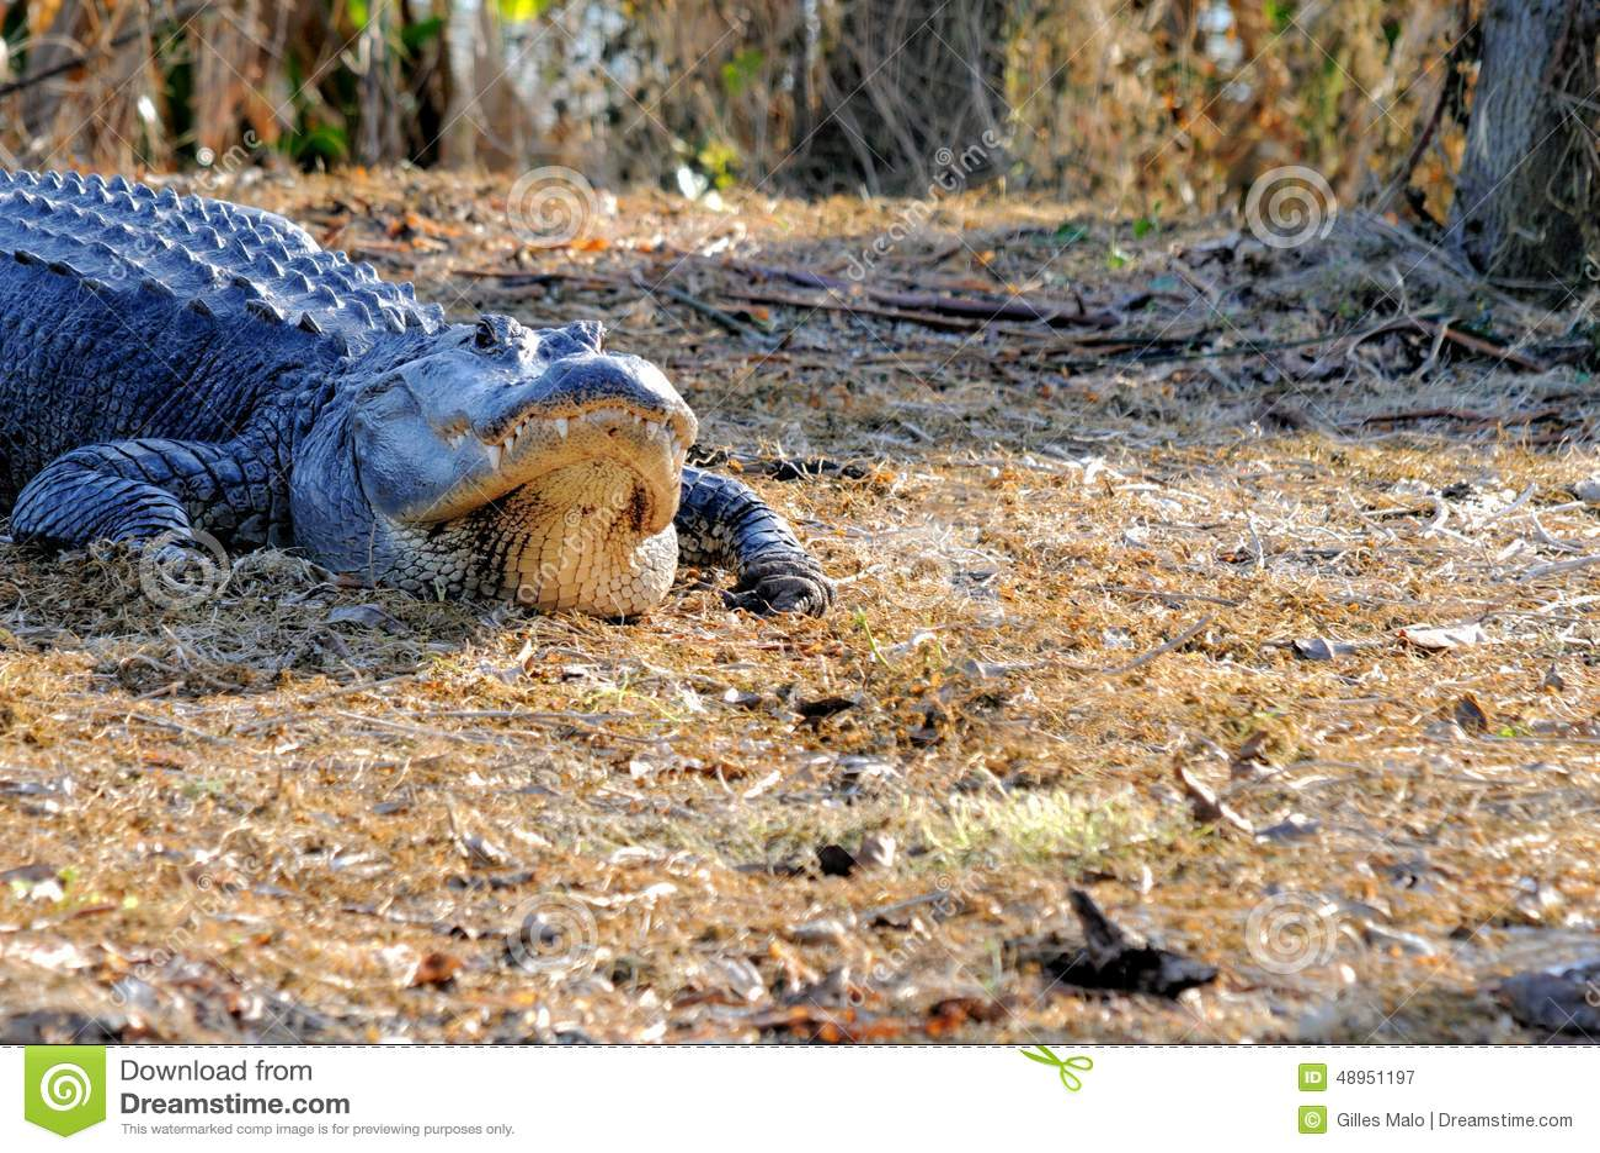 Huge American Alligator Okefenokee Swamp National